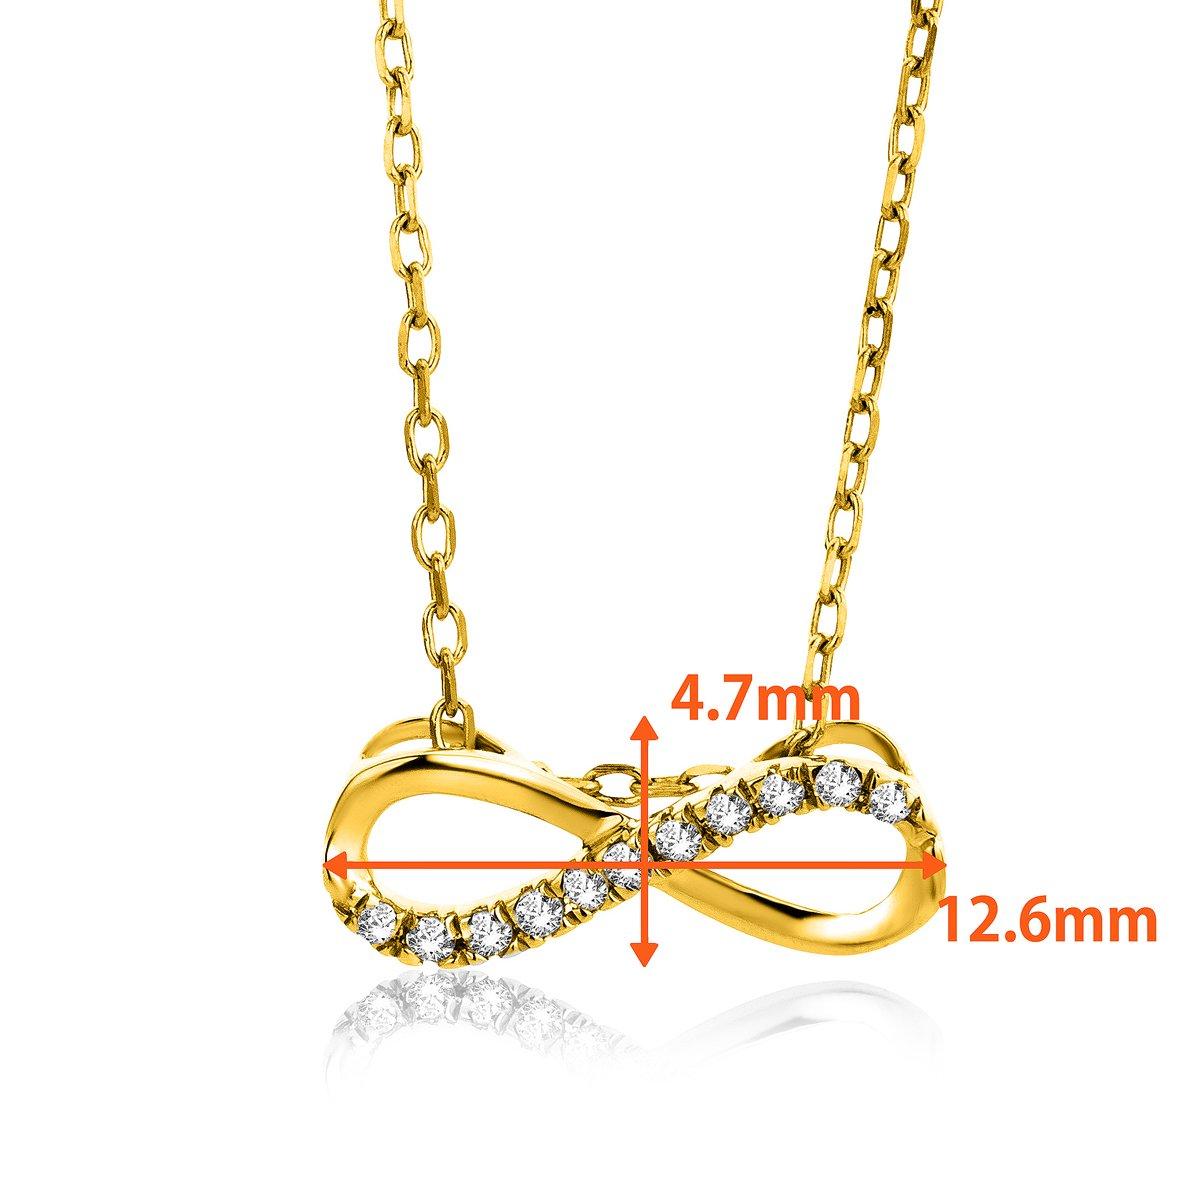 da6474158485 orovi Cadena para Mujer Joyas oro amarillo 9 quilates 375 oro collar  infinito infinity colgante con diamante brillantes 0